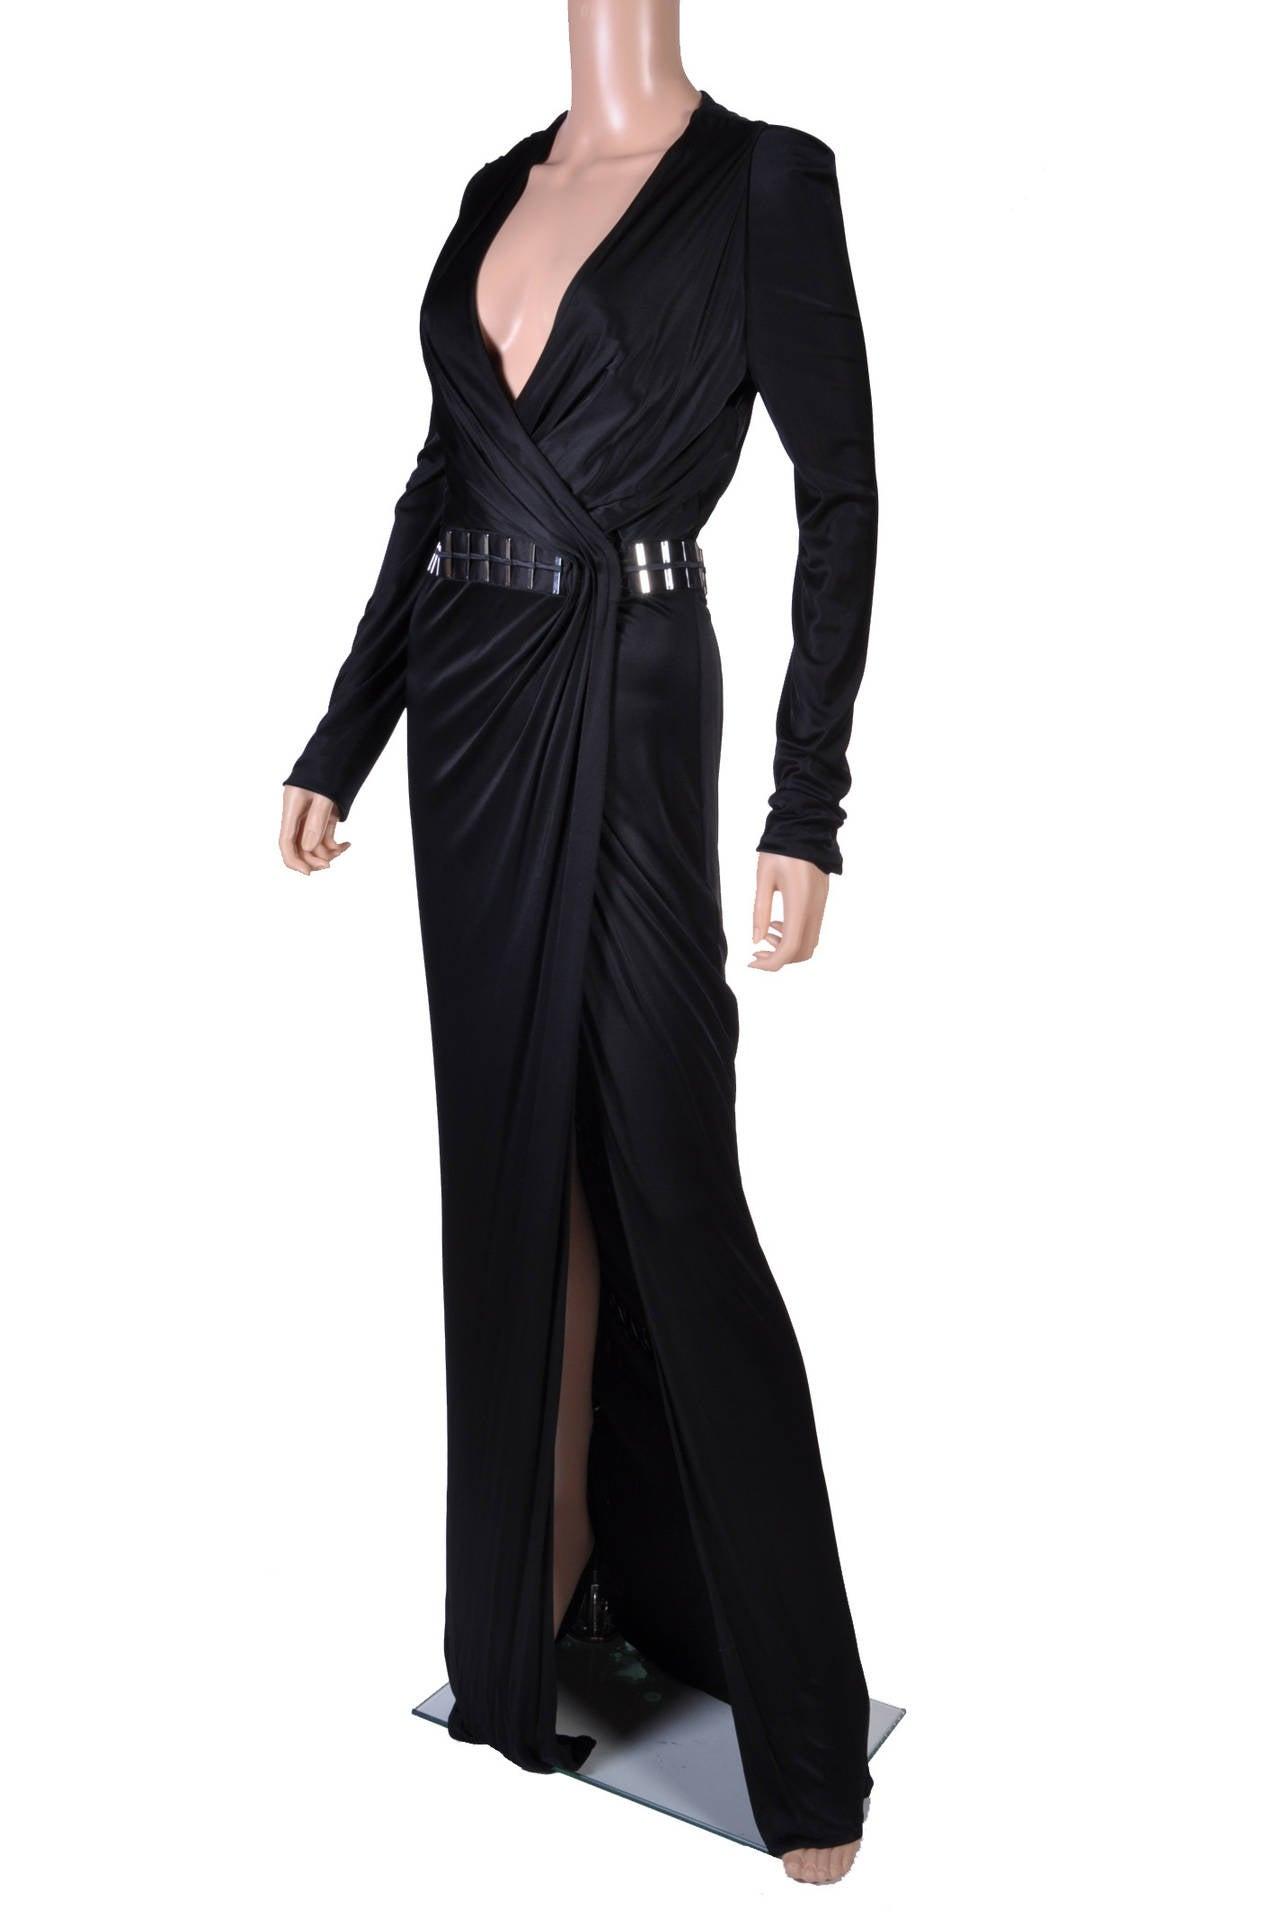 New VERSACE BLACK WRAP DRESS 3